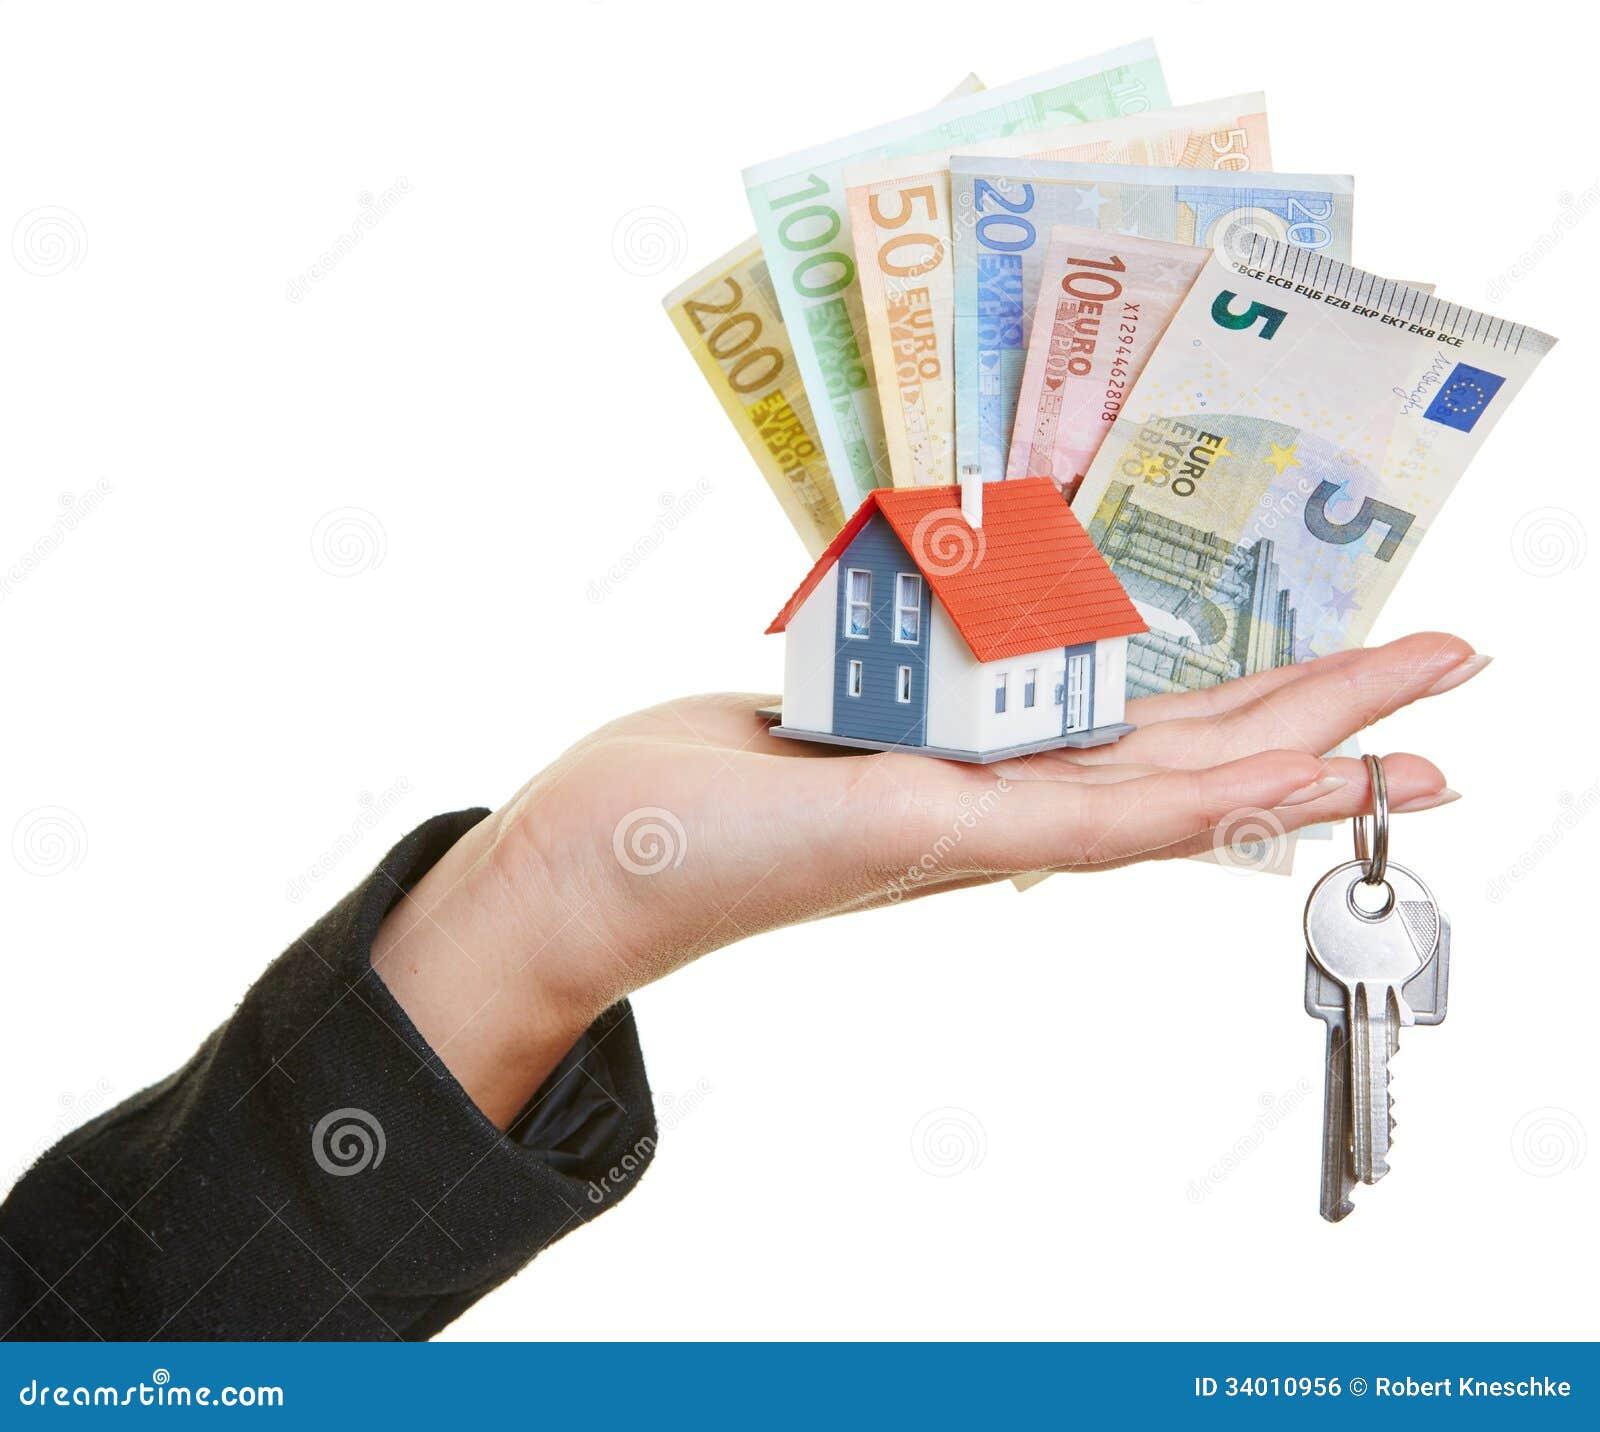 Картинки по запросу деньги ключи